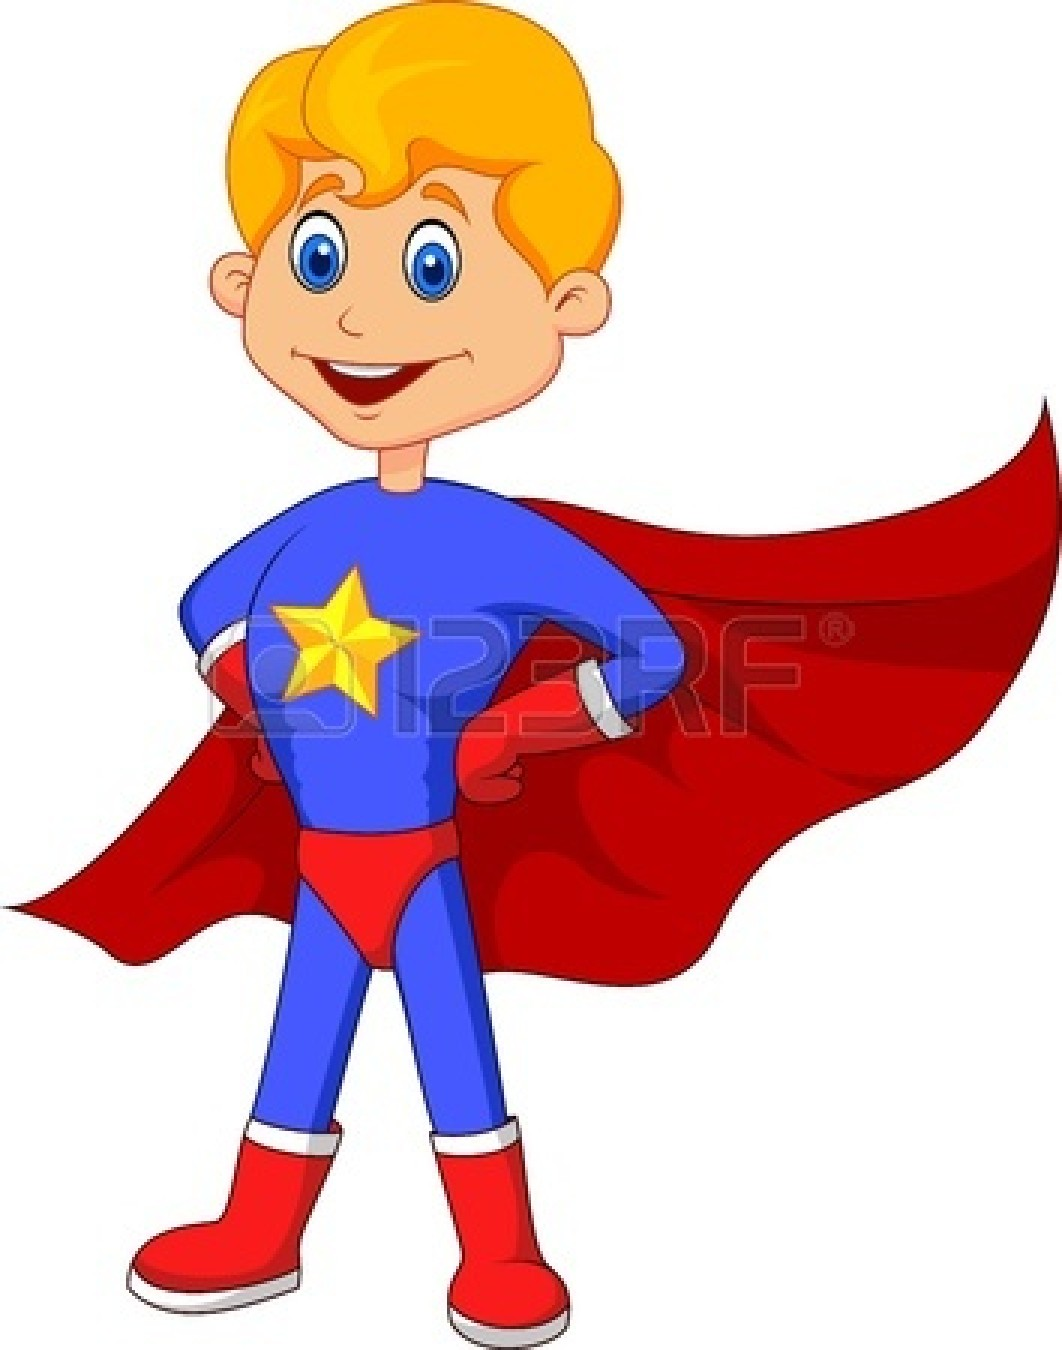 hero-cape-clipart-superman-cape-clipart-19583269-superhero-kid-cartoon ...